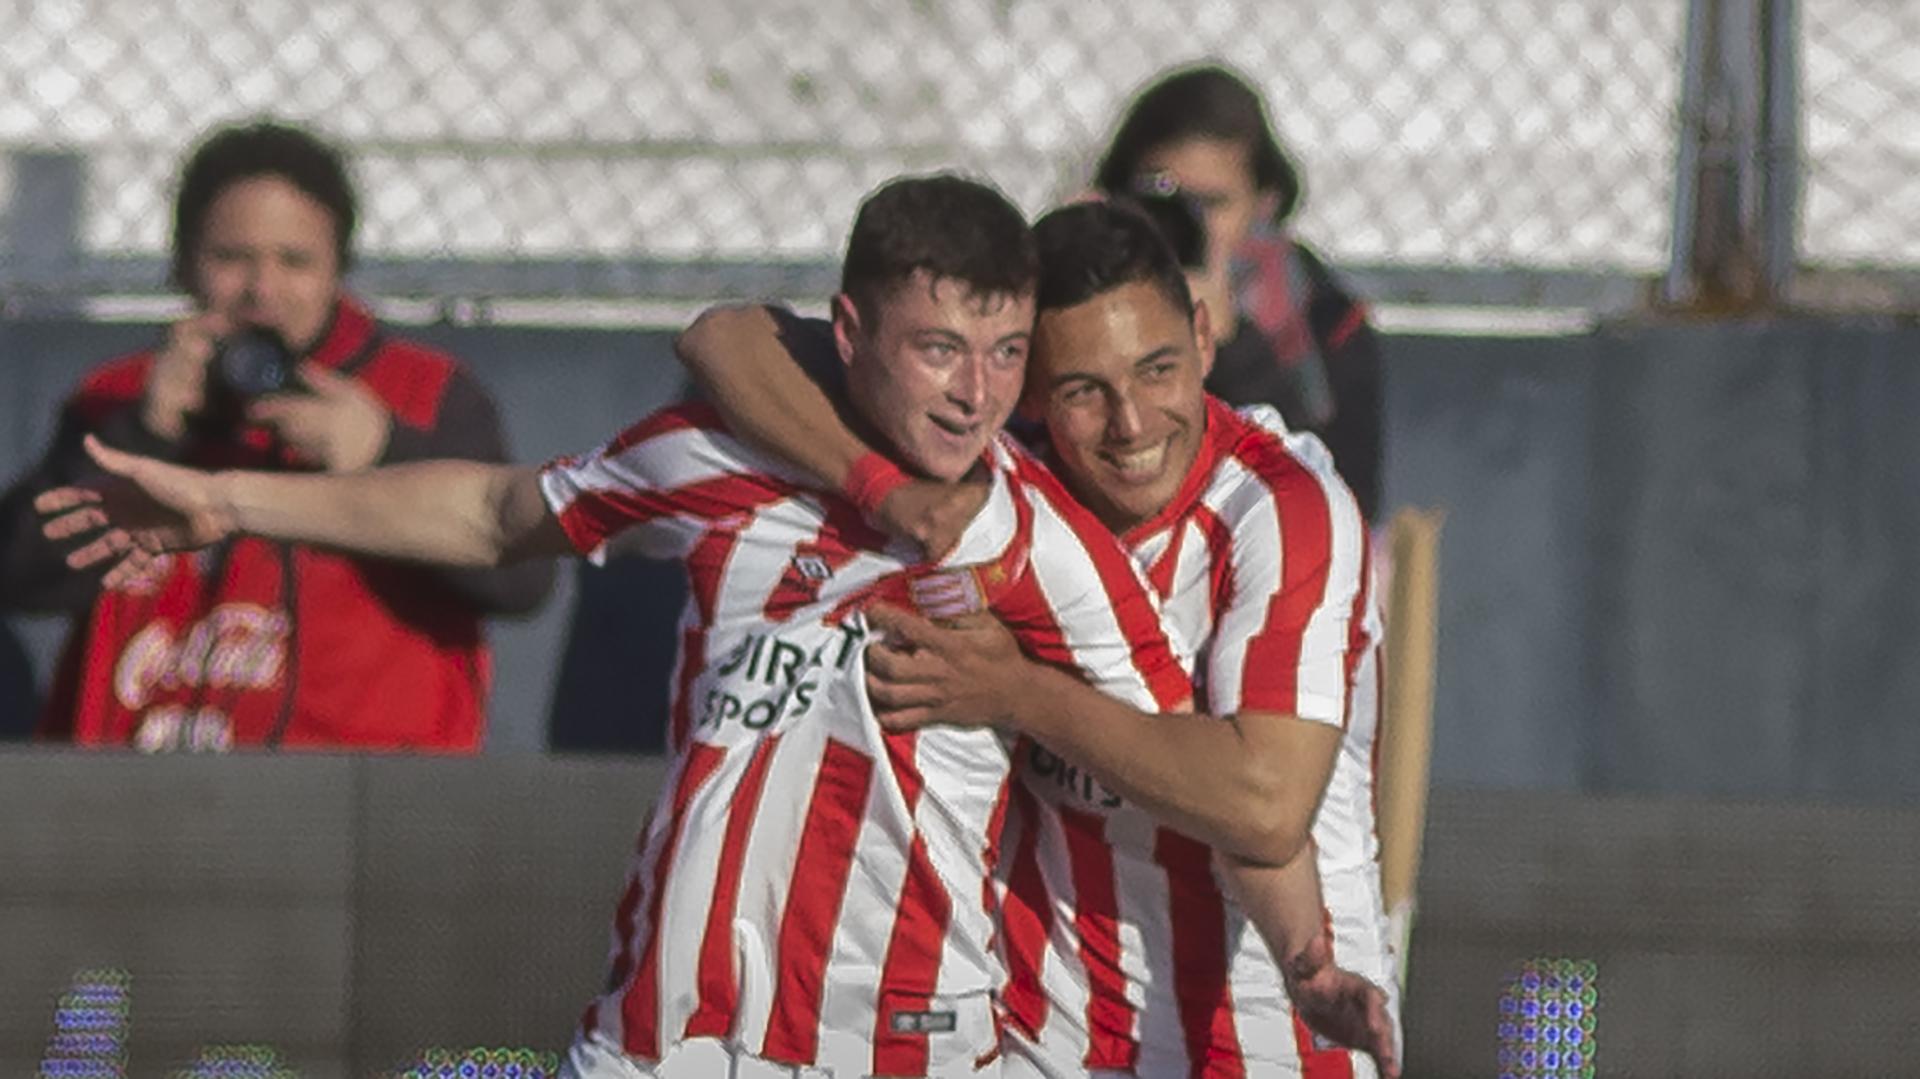 Matías Pellegrini festeja su gol contra Boca. Mañana se sumará al Sub 20 (Foto: NA)